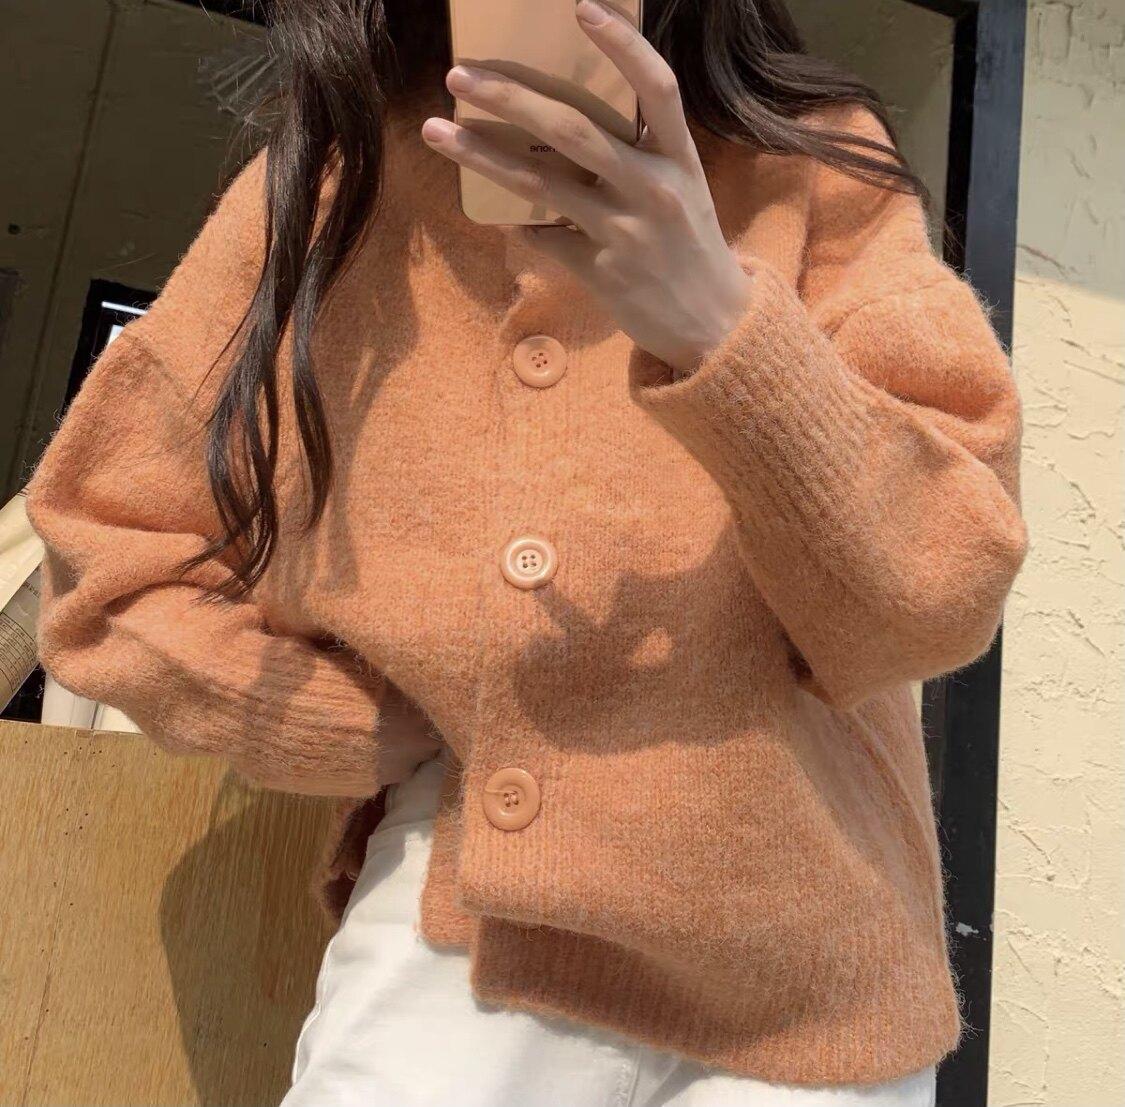 clothesfriend.co-คาร์ดิแกนไหมพรม Punch cardigan (สีม่วง/สีชมพูเข้าเพิ่มกลางเดือน ส.ค.)